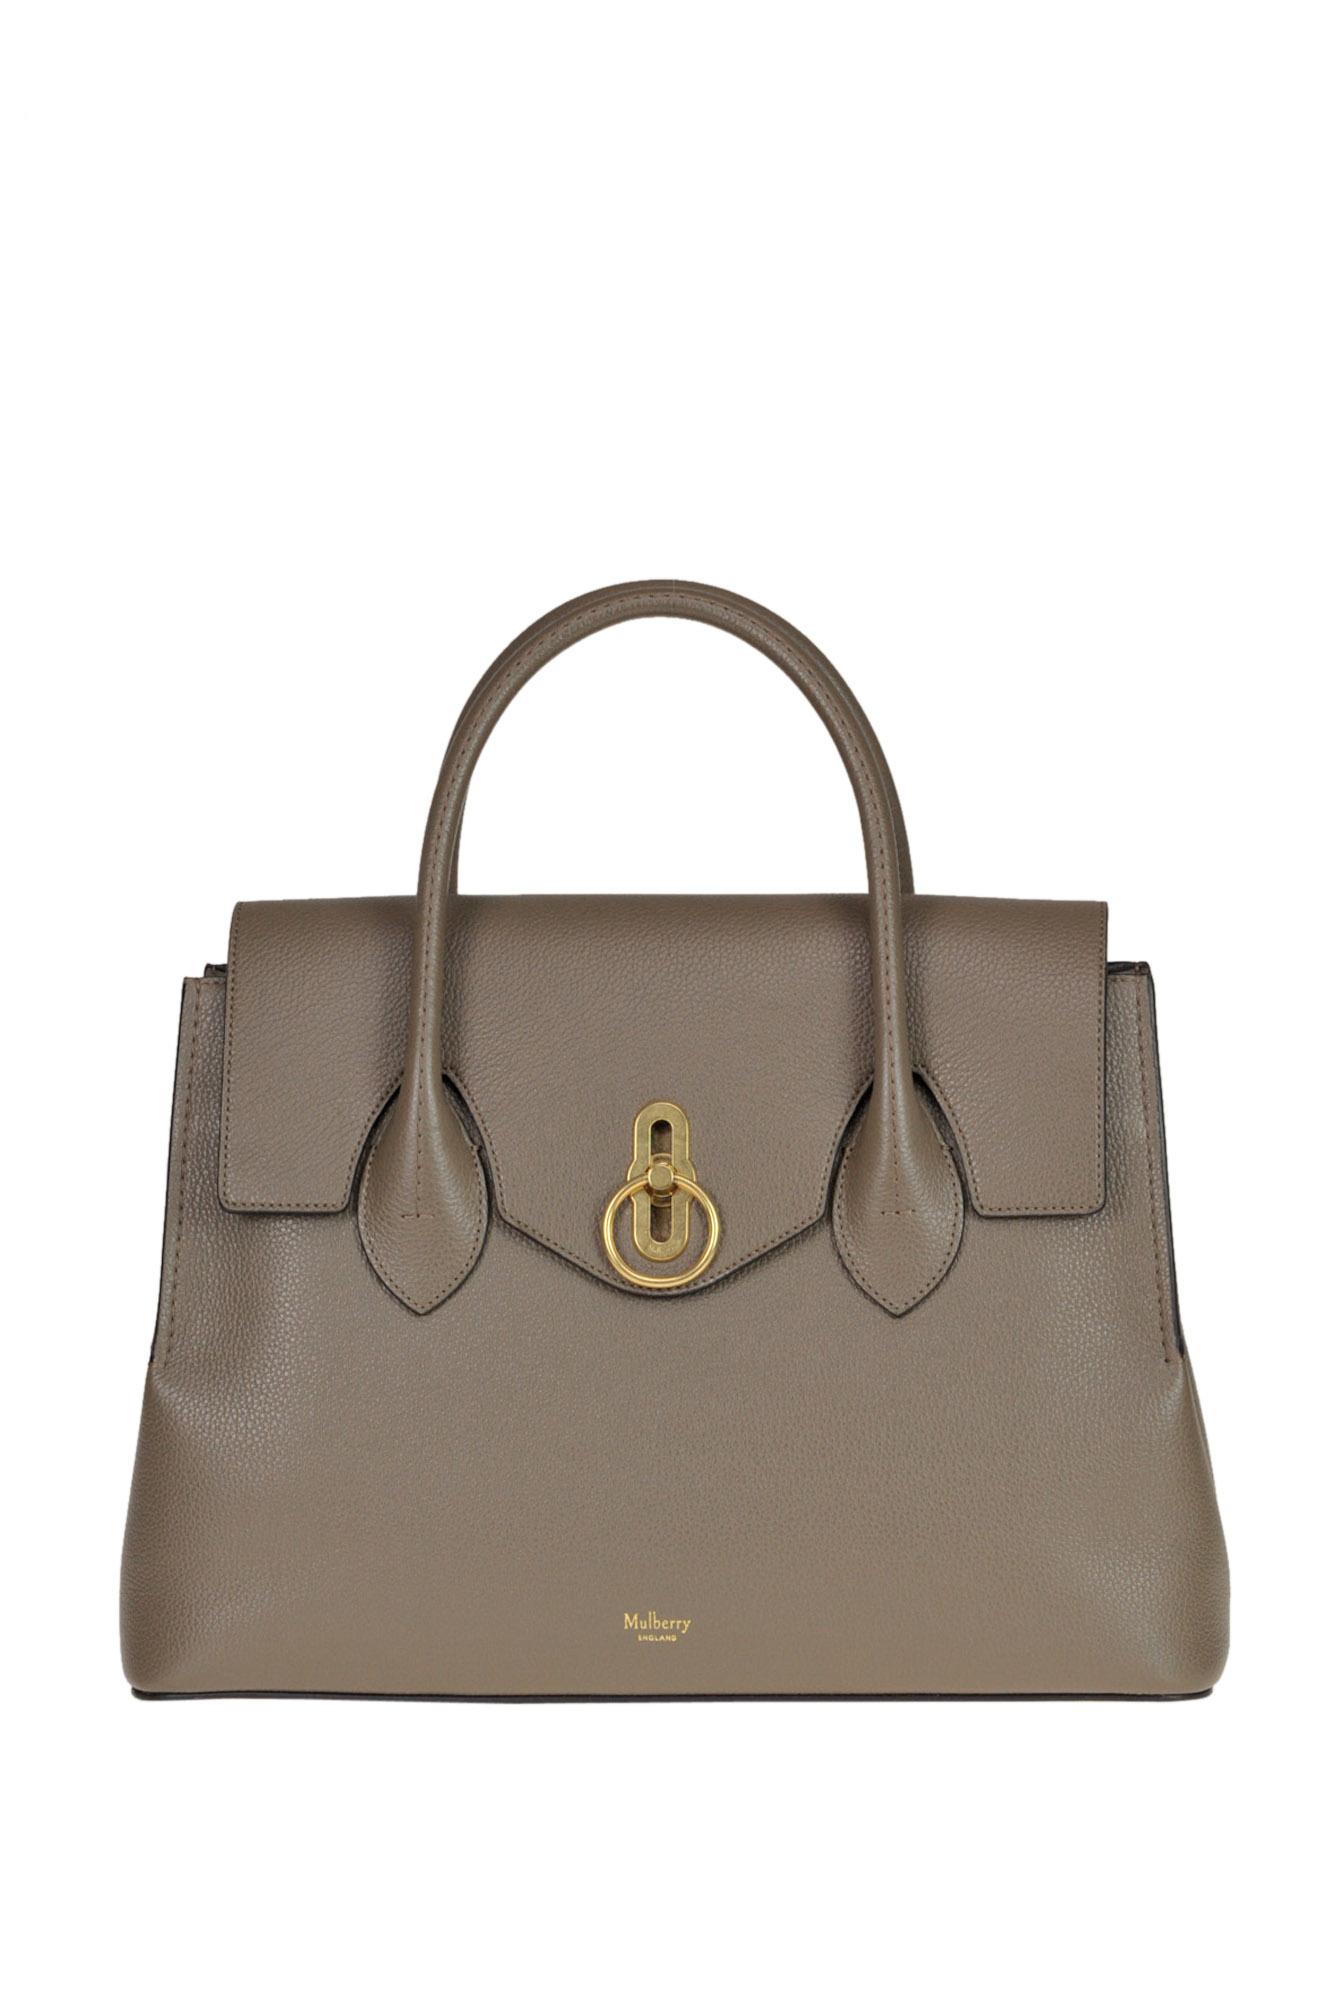 Mulberry Seaton Classic Tote Bag In Dove-Grey